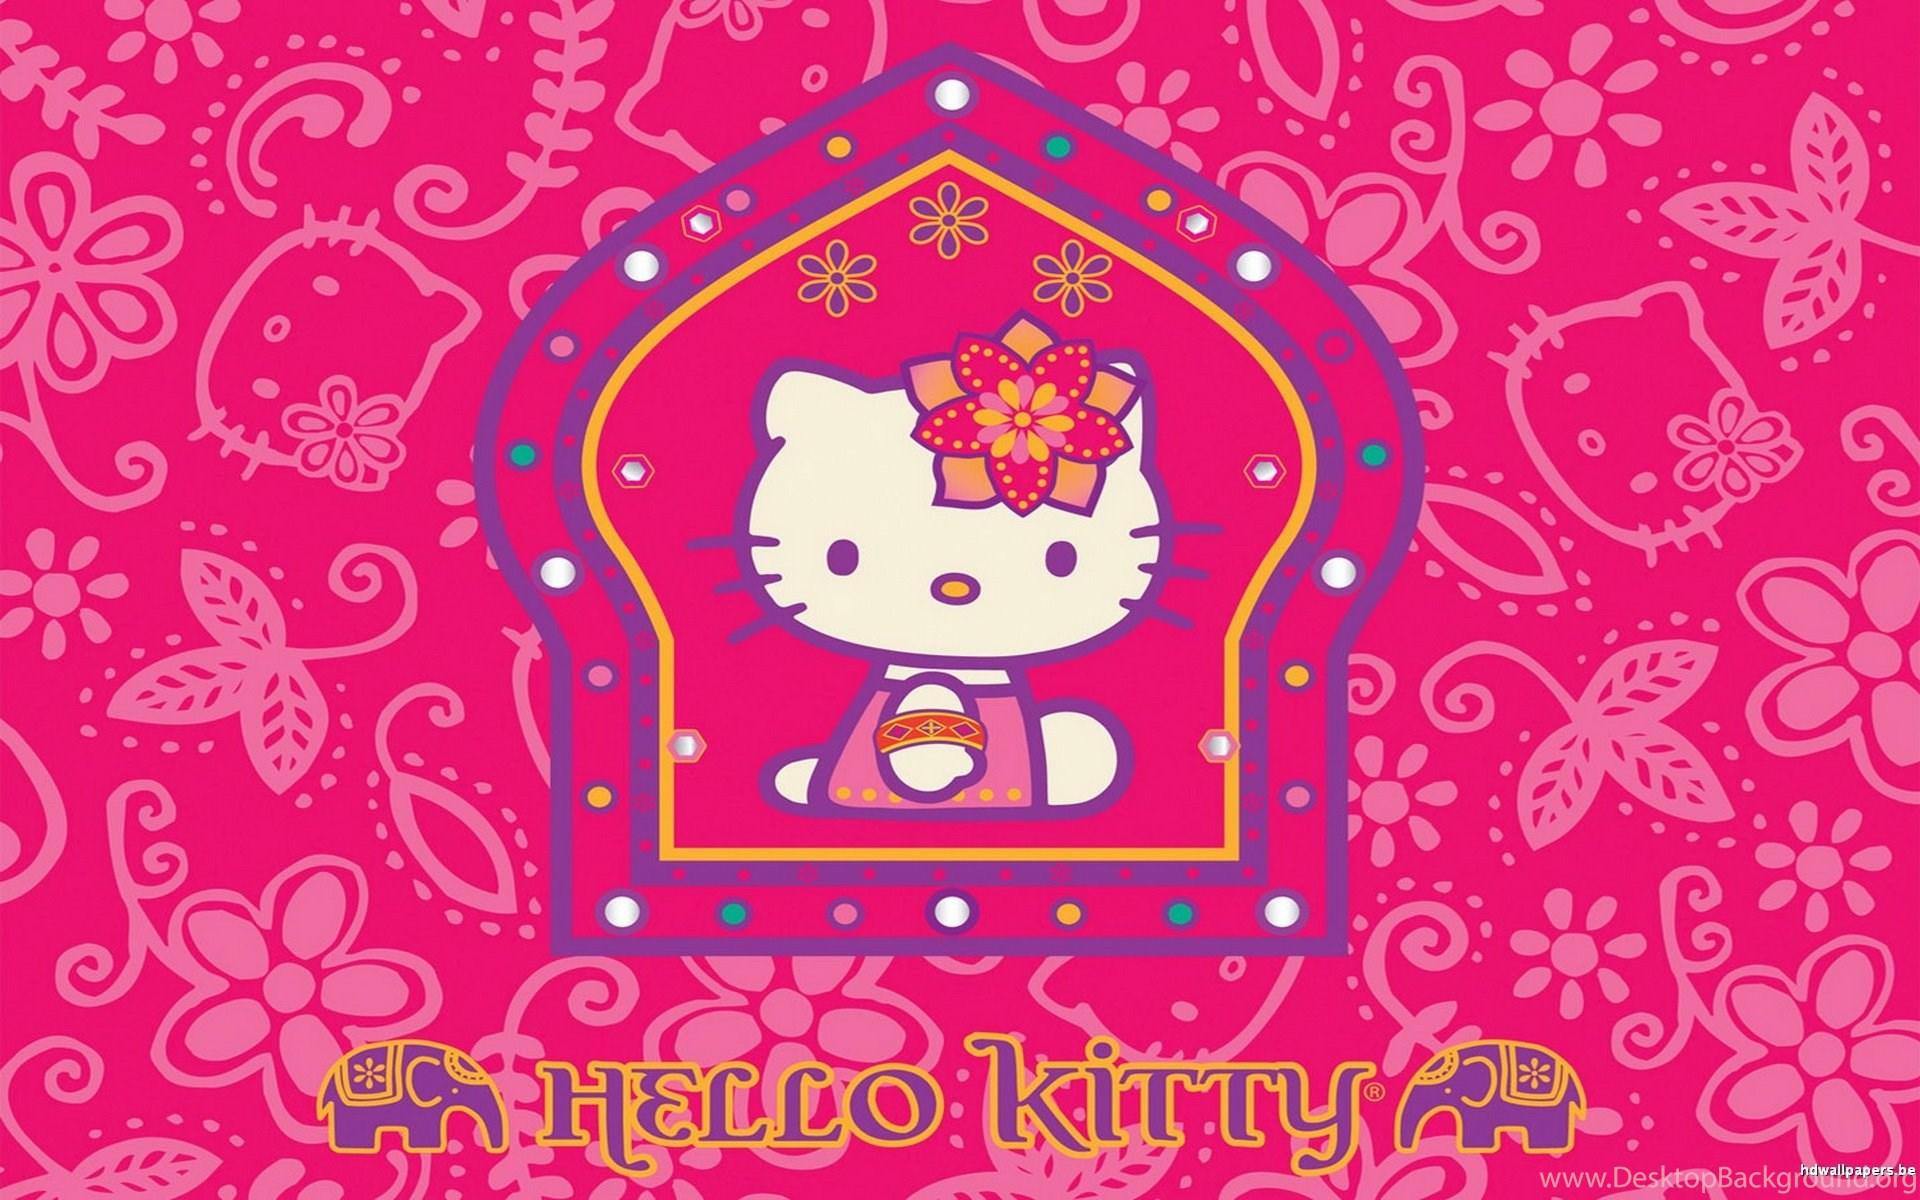 Simple Wallpaper Hello Kitty Desktop Background - 824350_sanrio-hello-kitty-desktop-wallpaper-images_1920x1200_h  Collection_292718.jpg